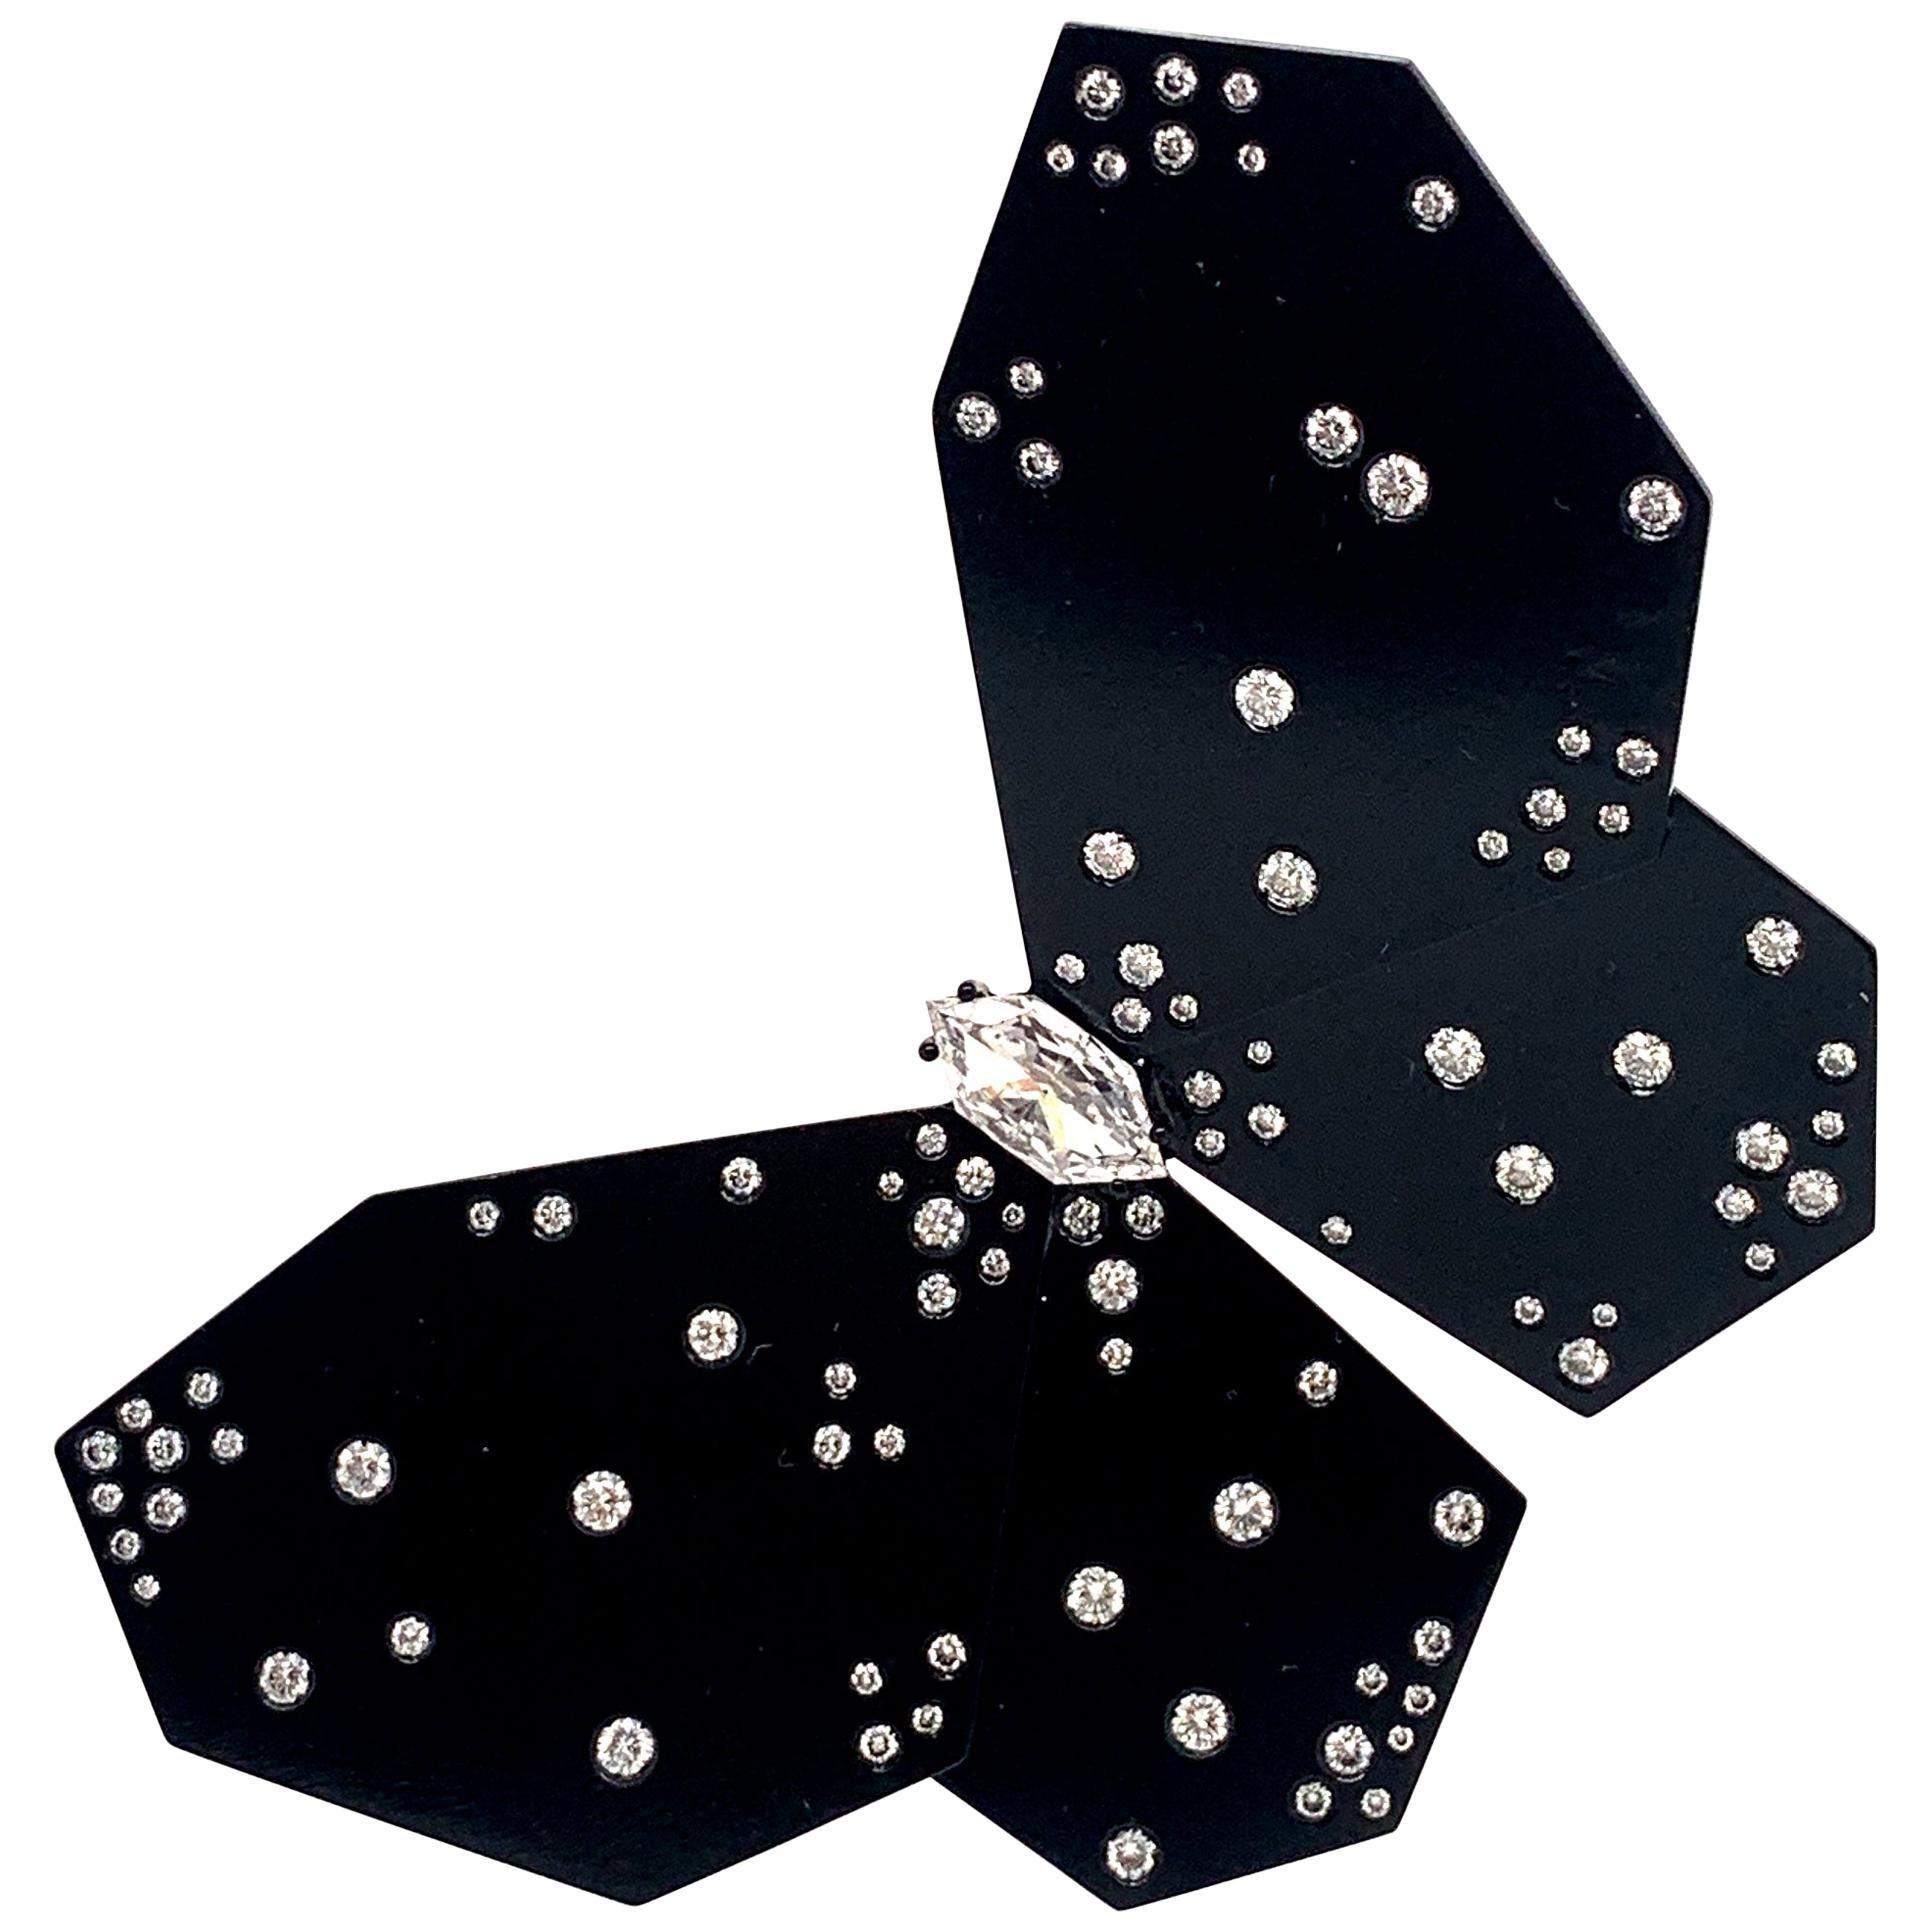 Titanium and Gold Black Butterfly Diamonds Earring 'single' 2.51 Carat Diamonds